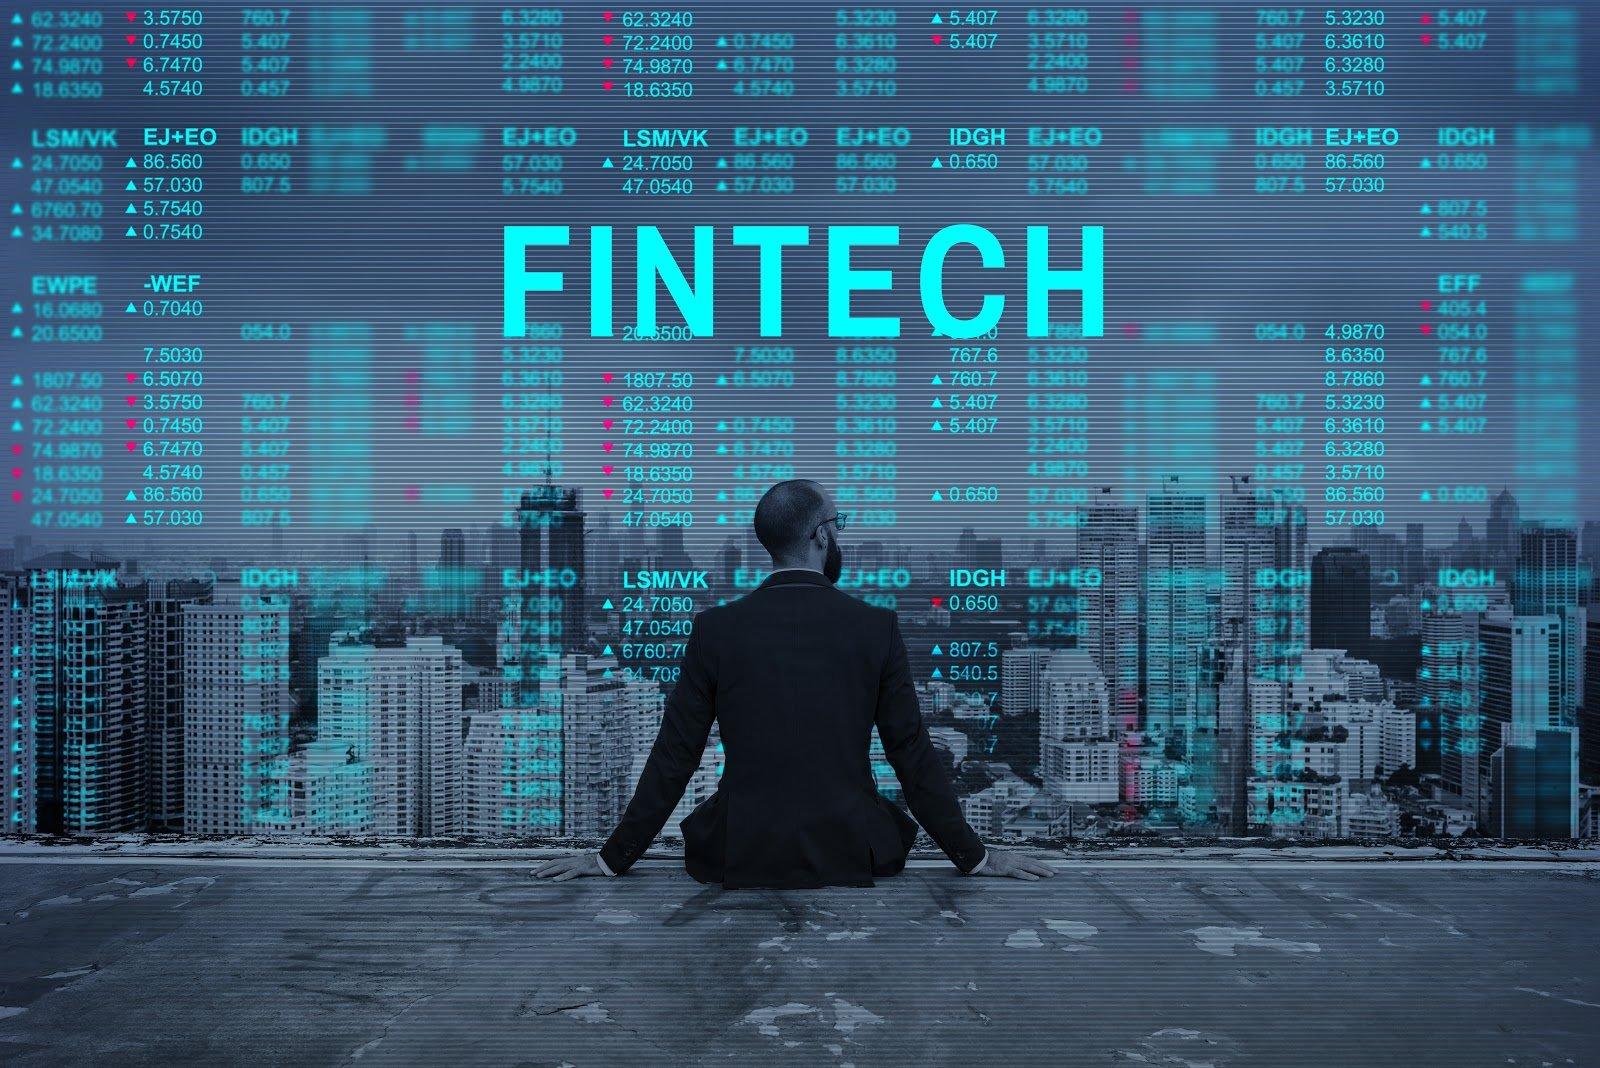 fintech-investment-250million dolars-servies-startups-expansion-propel-bbva